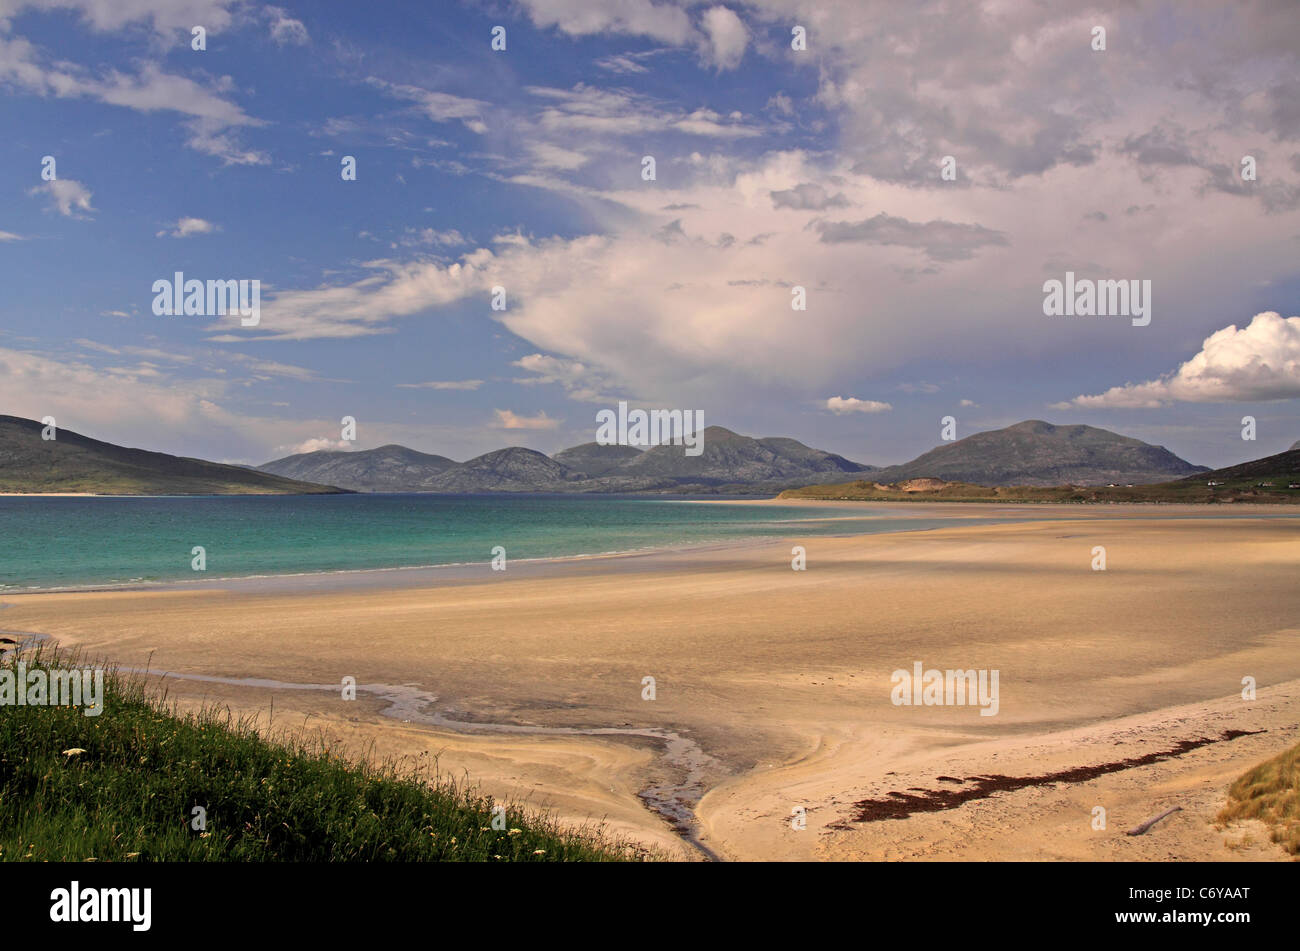 UK Scotland Outer Hebrides Isle of Harris Seilbost Bay and the Harris Mountains Stock Photo